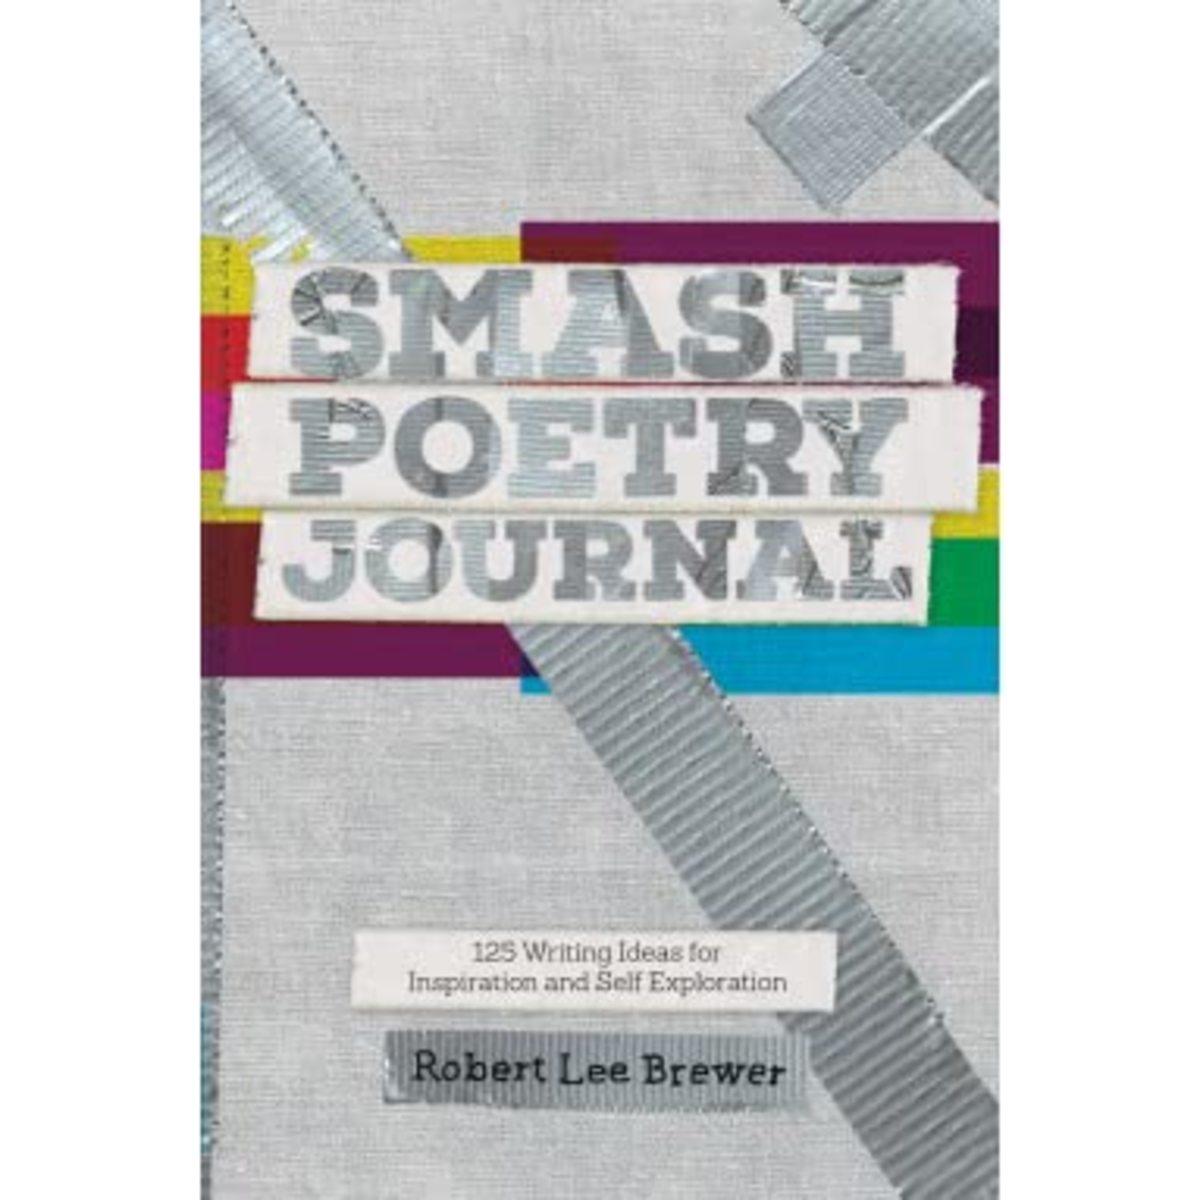 smash poetry journal robert lee brewer